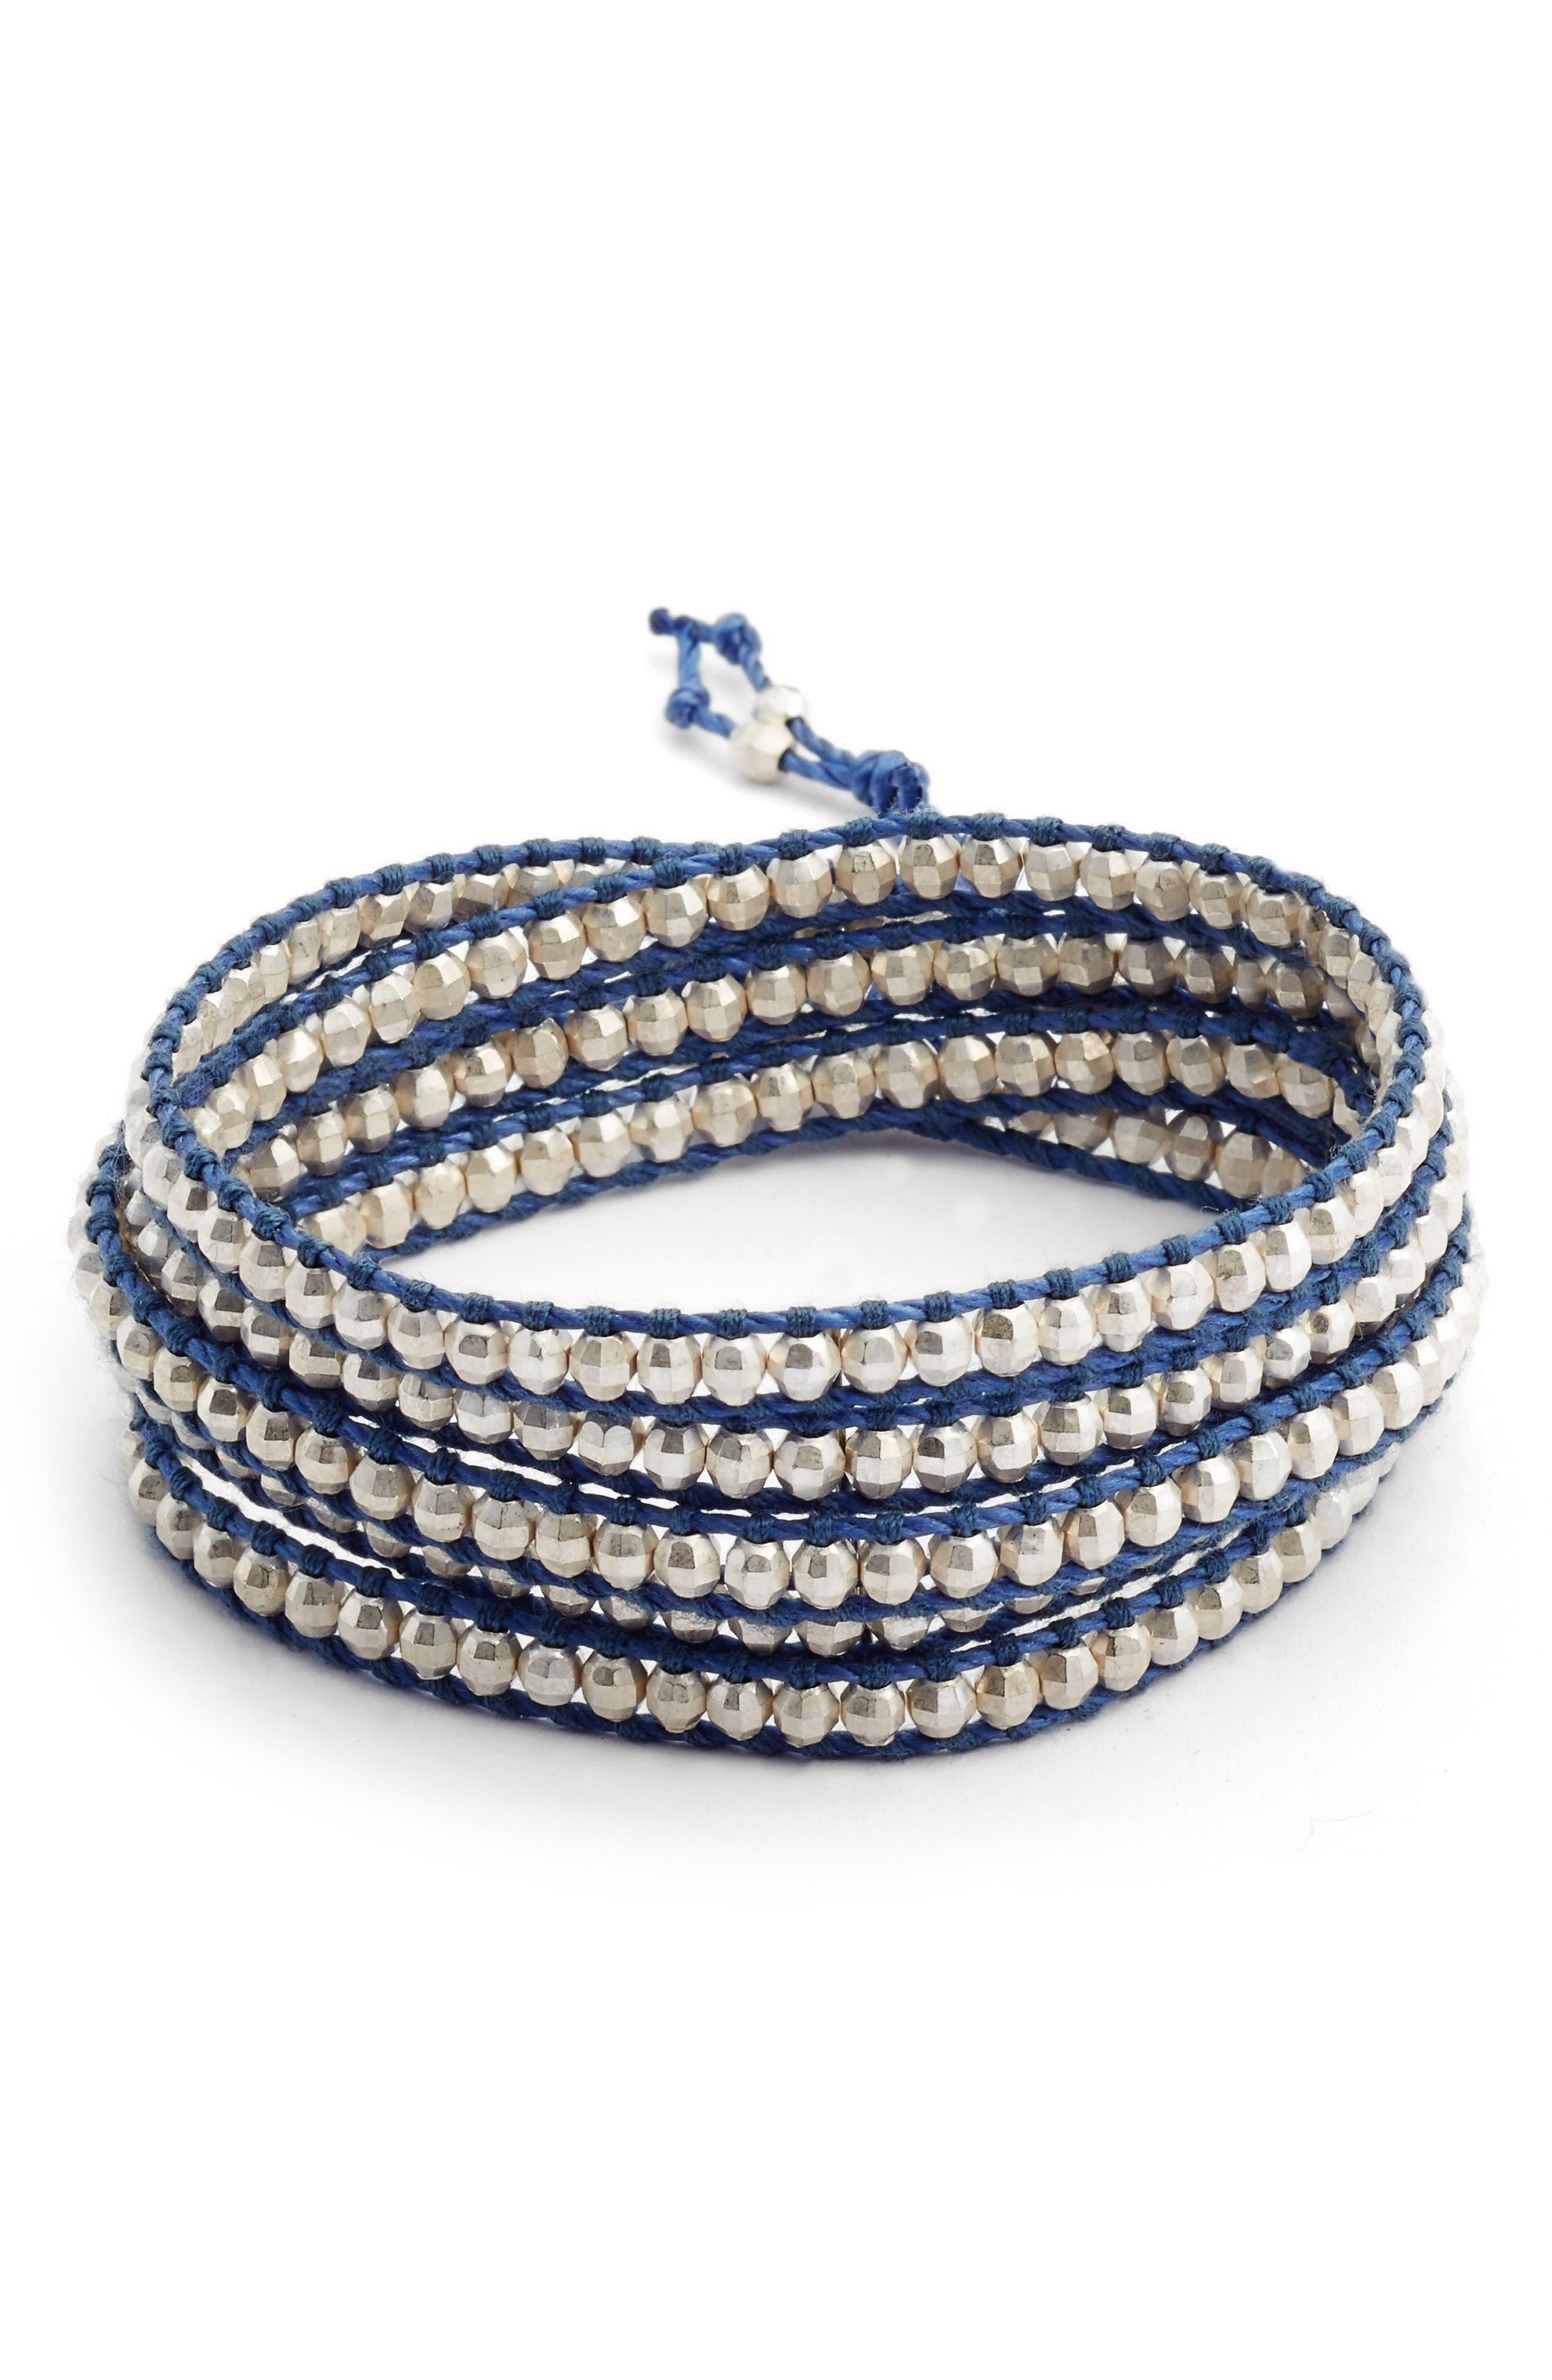 Beaded Multistrand Bracelet,                         Main,                         color, Silver/ Periwinkle